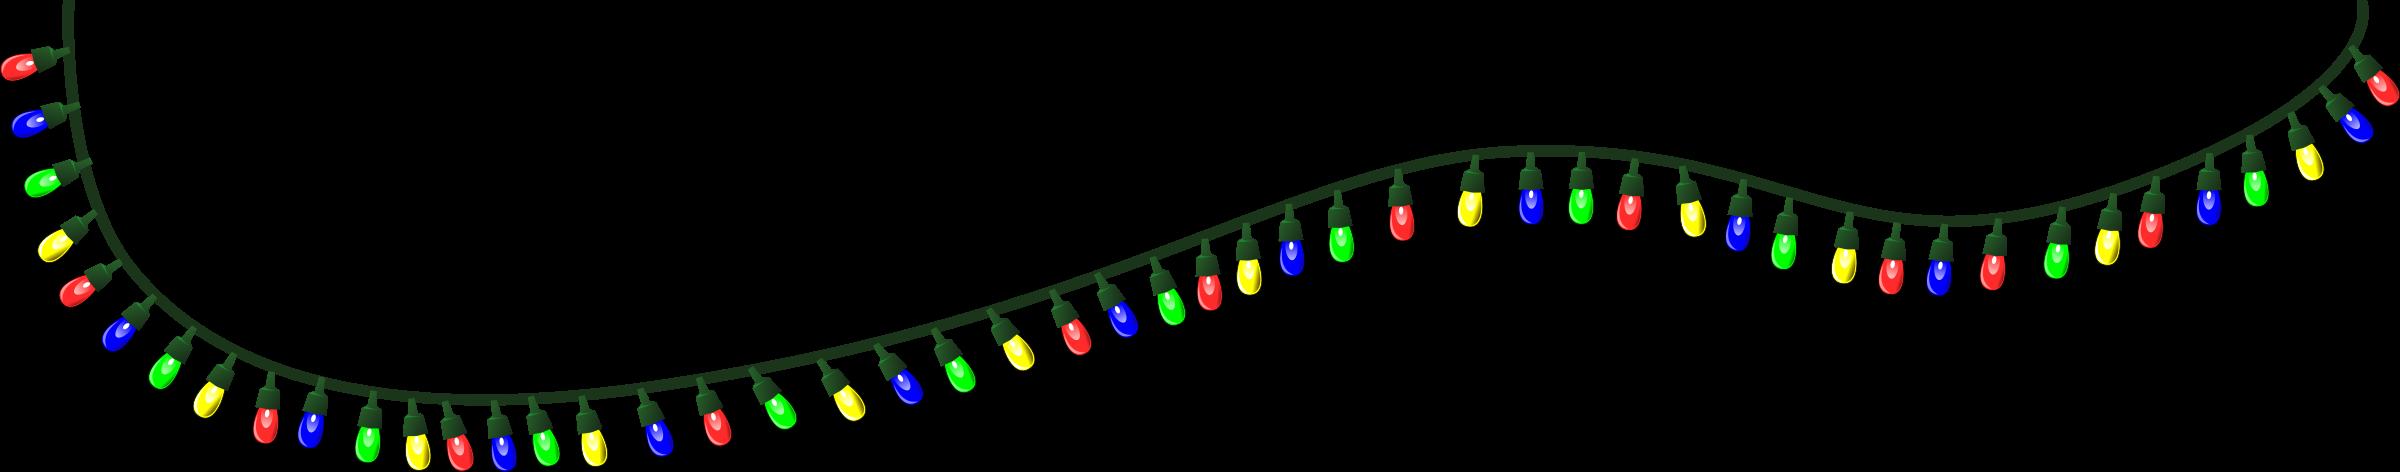 Christmas lights clipart tumundografico-Christmas lights clipart tumundografico-15